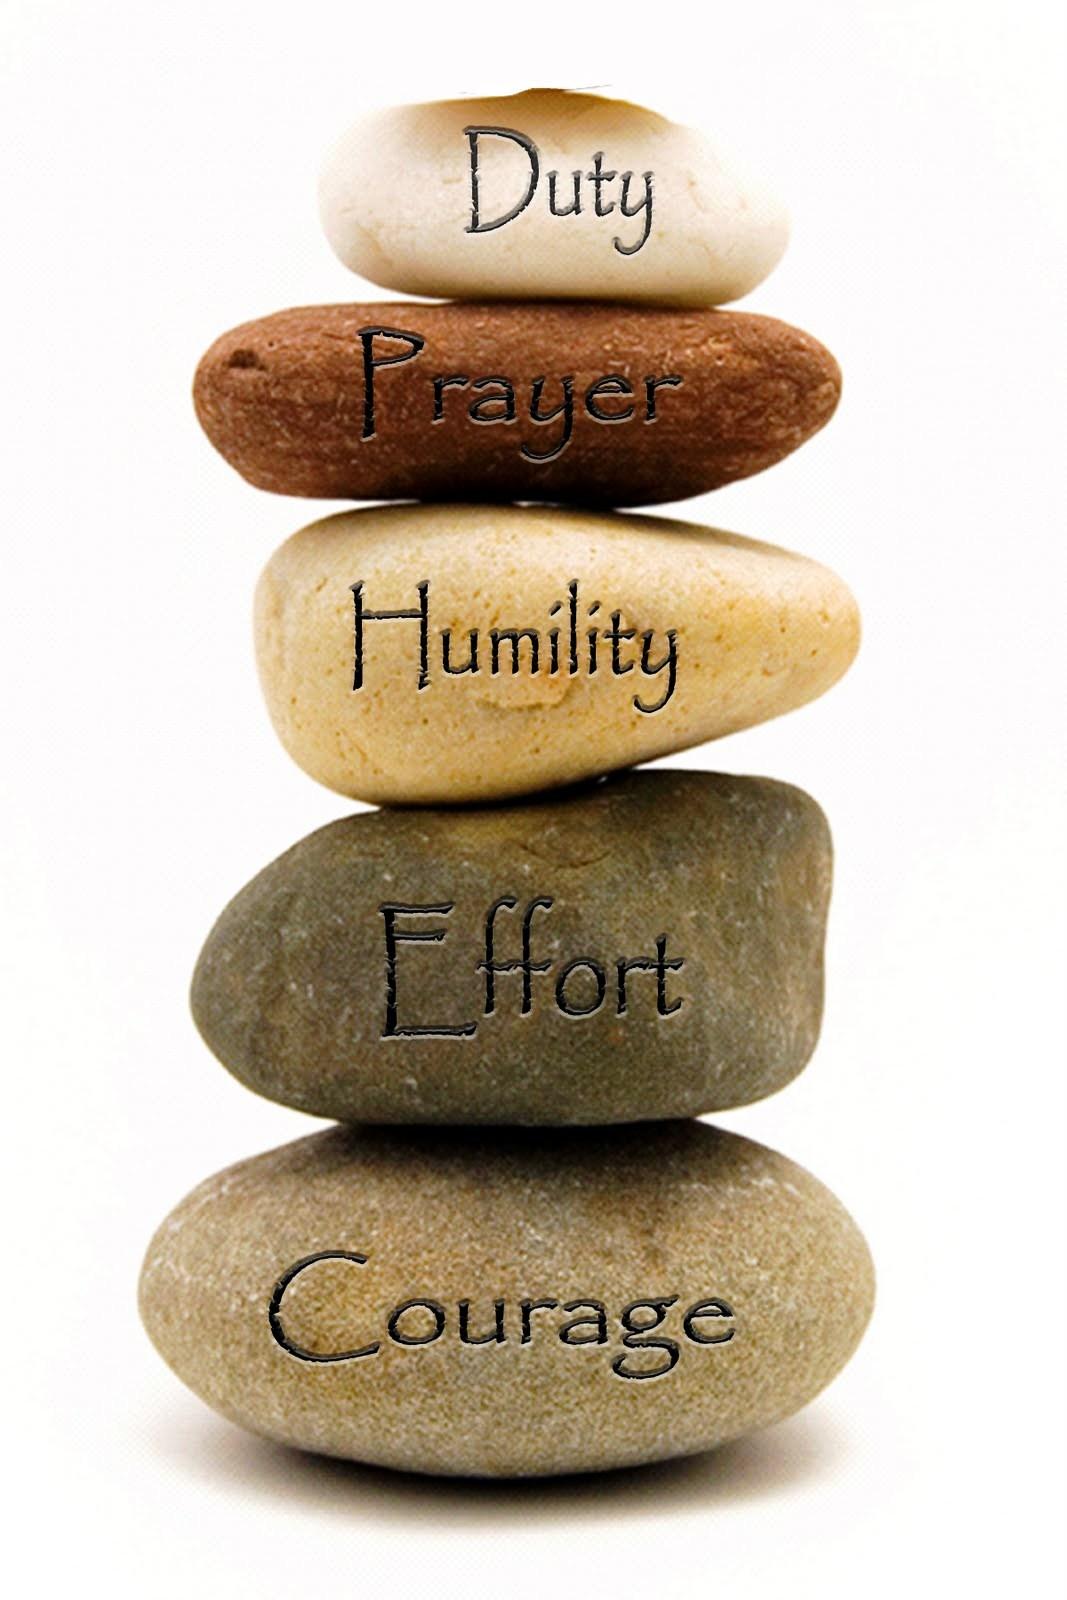 http://4.bp.blogspot.com/-1up36qnpqaM/T7zDCqyWjGI/AAAAAAAABHY/1xwWyV_1fww/s1600/Samuel_17_5_Stones_Virtues.jpg